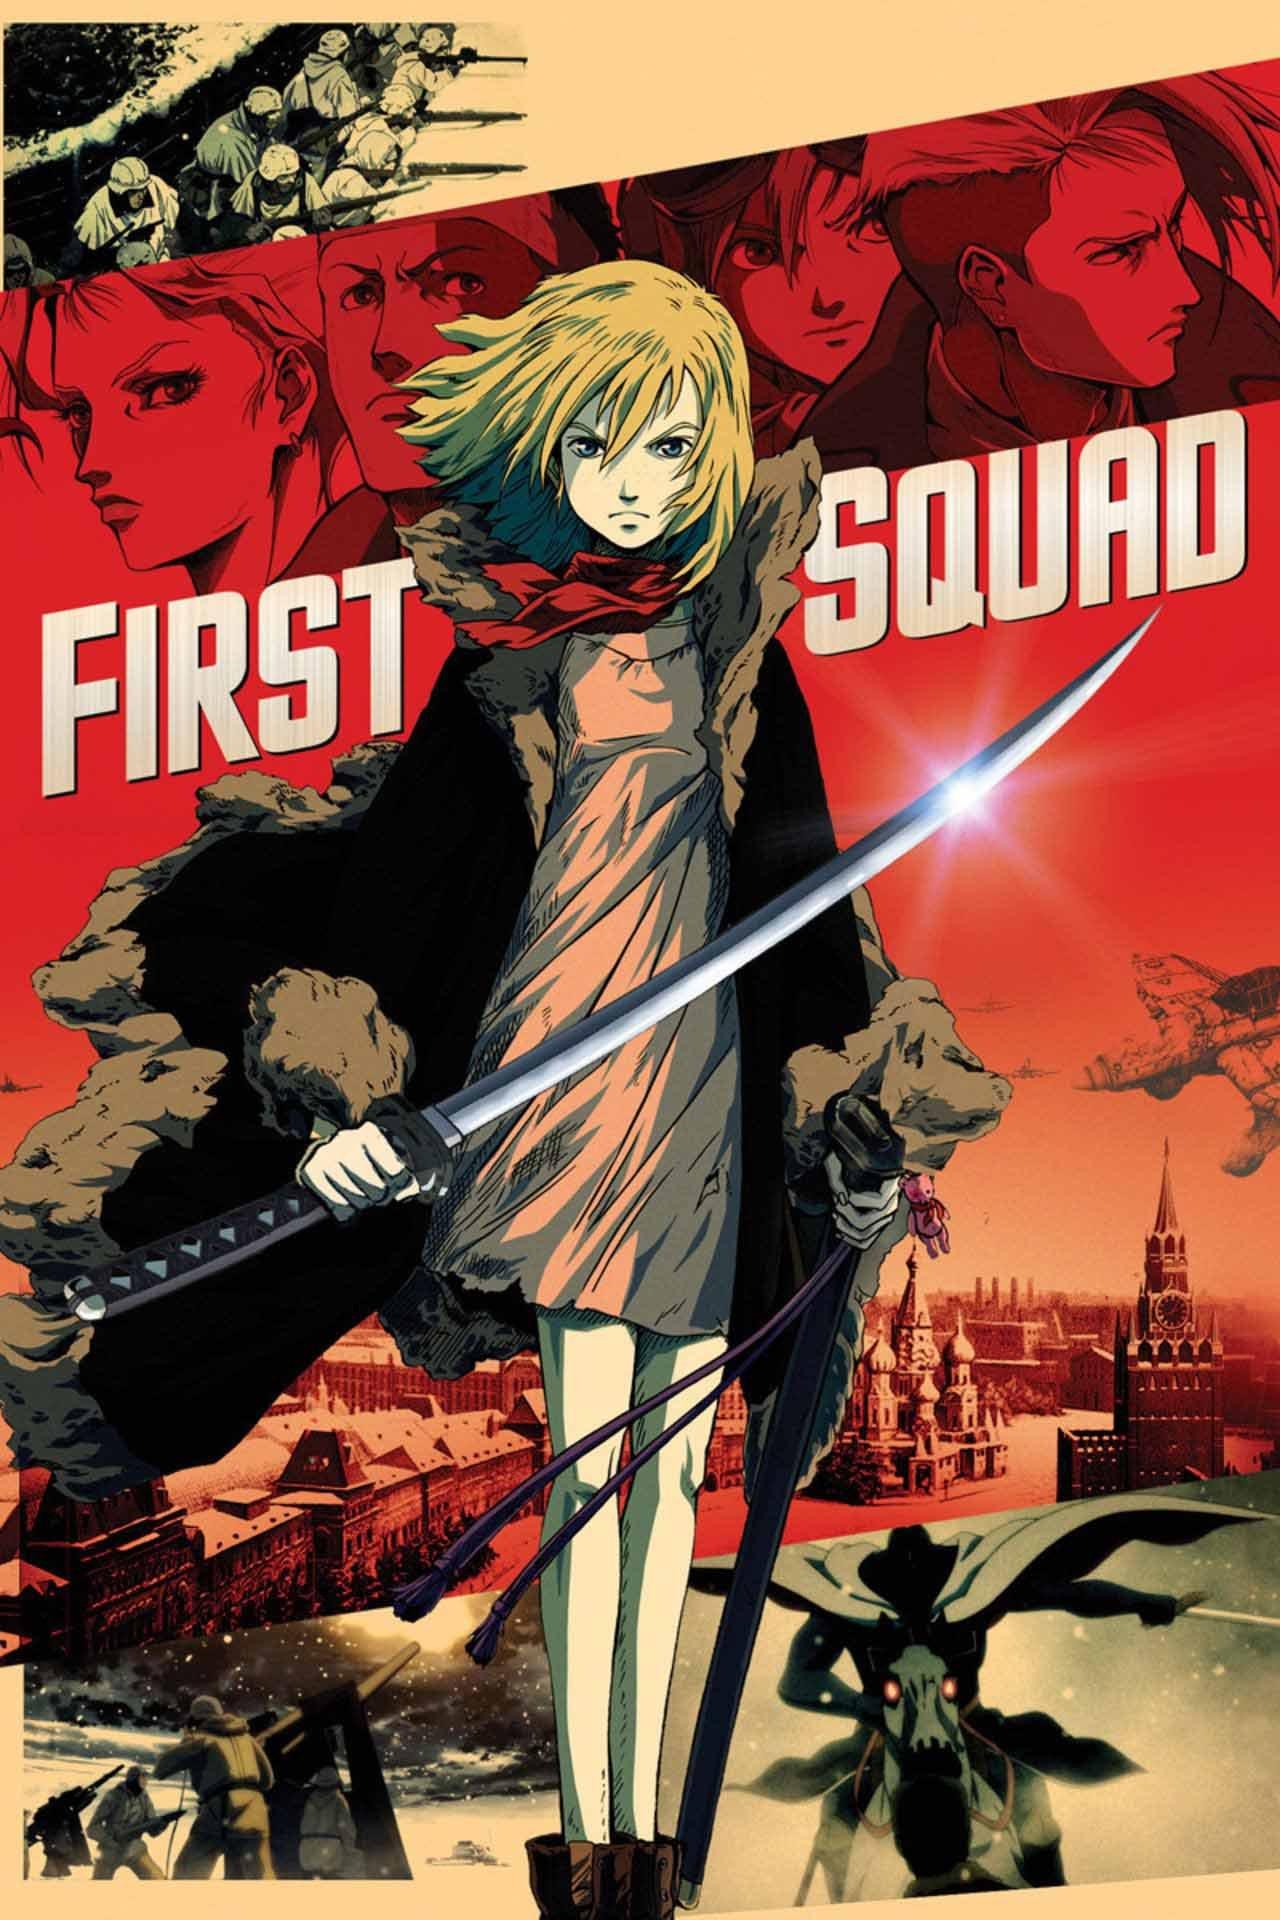 Смотреть პირველი რაზმი / First Squad: The Moment of Truth онлайн бесплатно - {short-story limit=